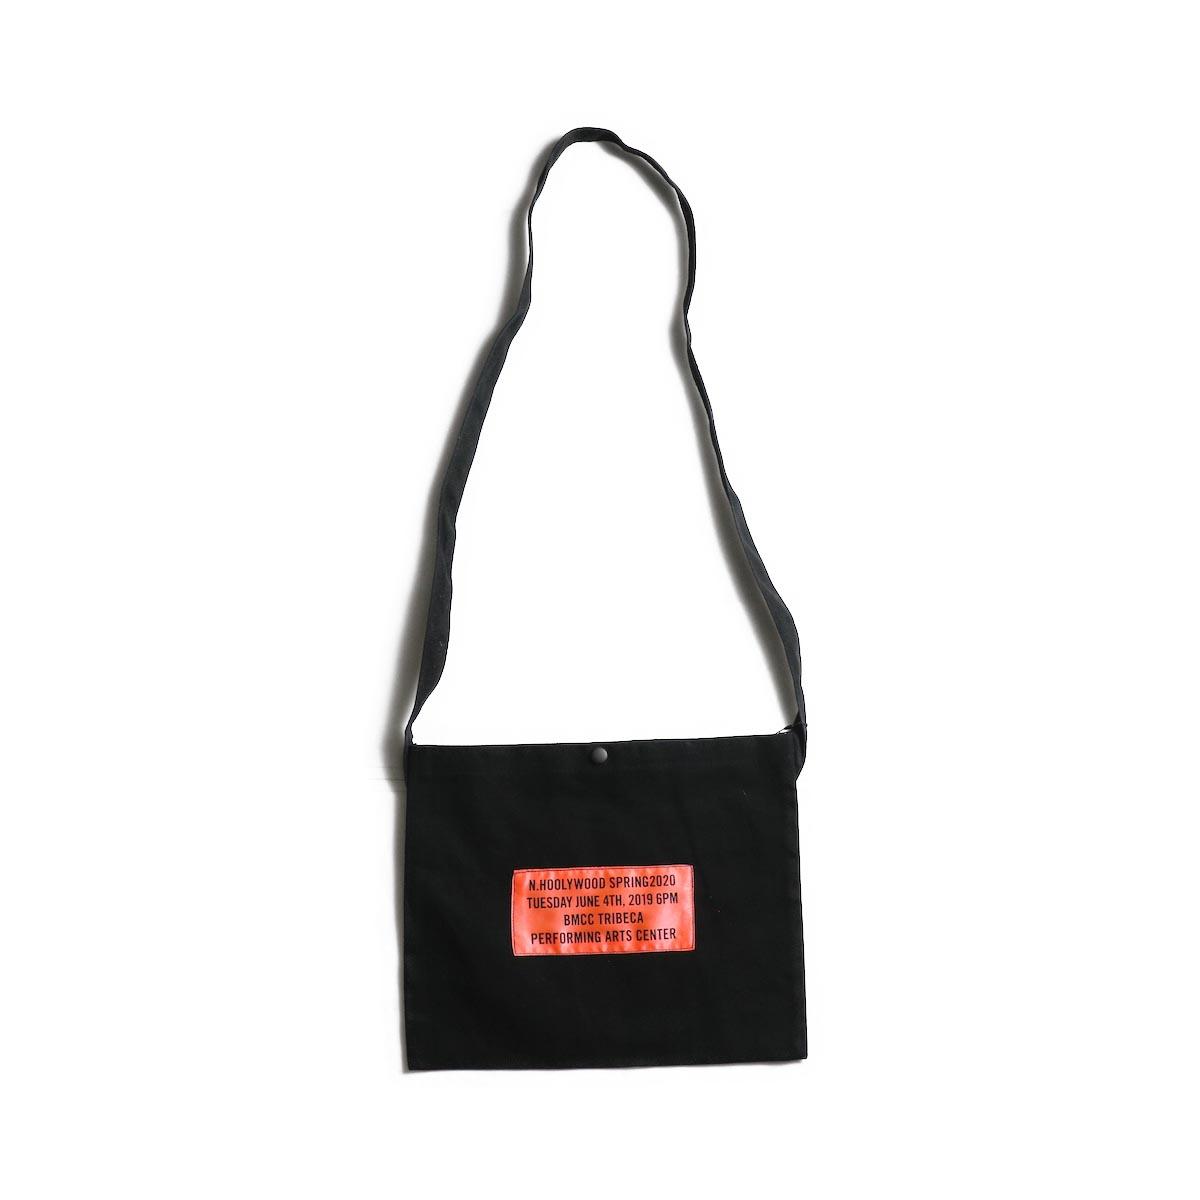 N.HOOLYWOOD / 1201-AC82 Shoulder Bag (Black)